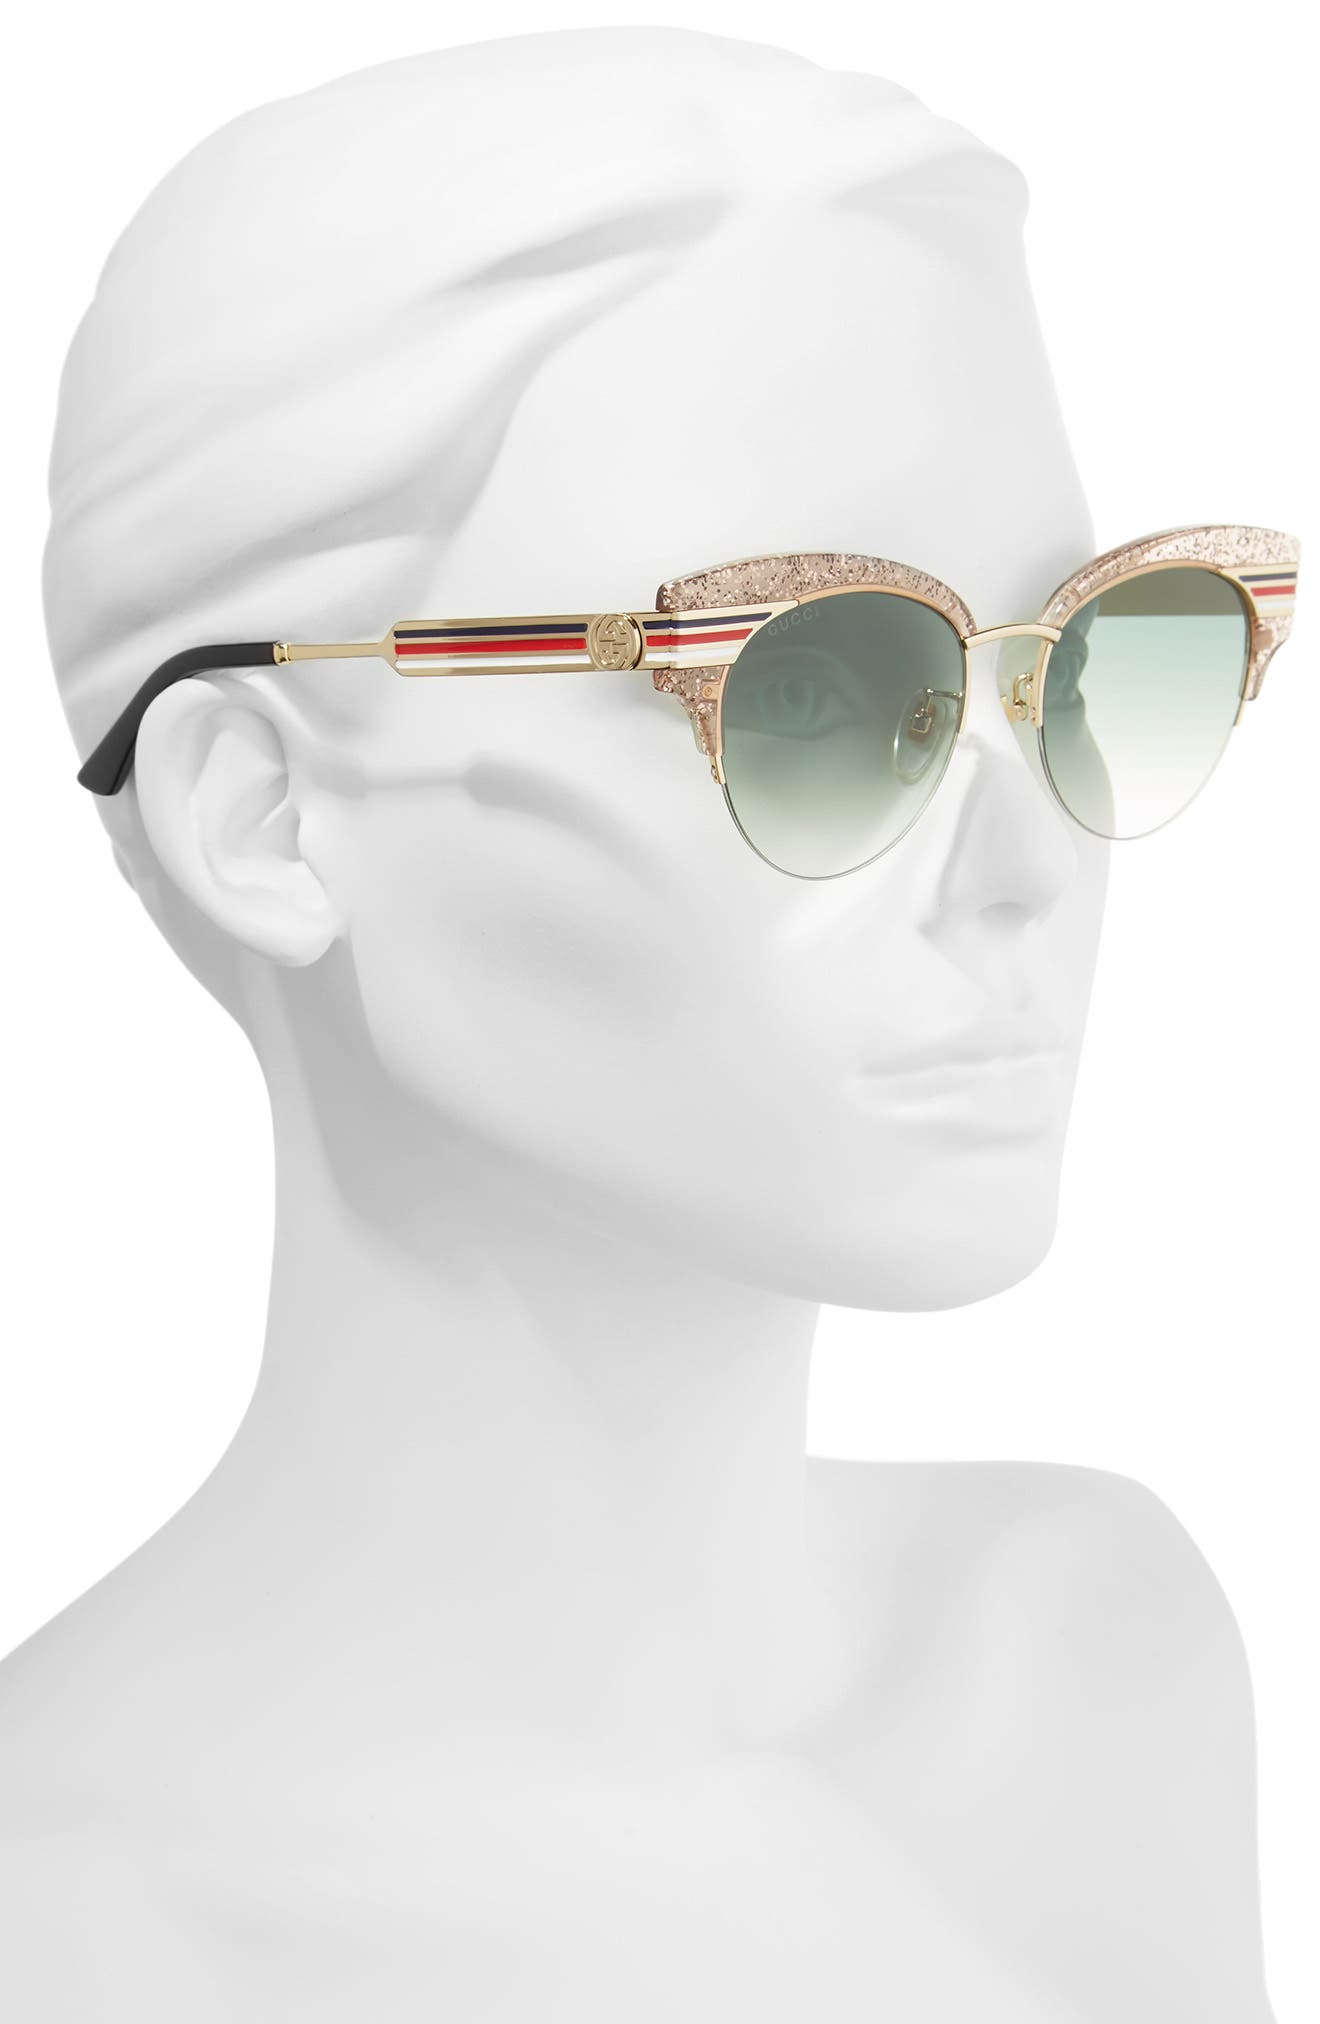 53mm Cat Eye Sunglasses,                             Alternate thumbnail 2, color,                             NUDE/ GOLD/ BLACK